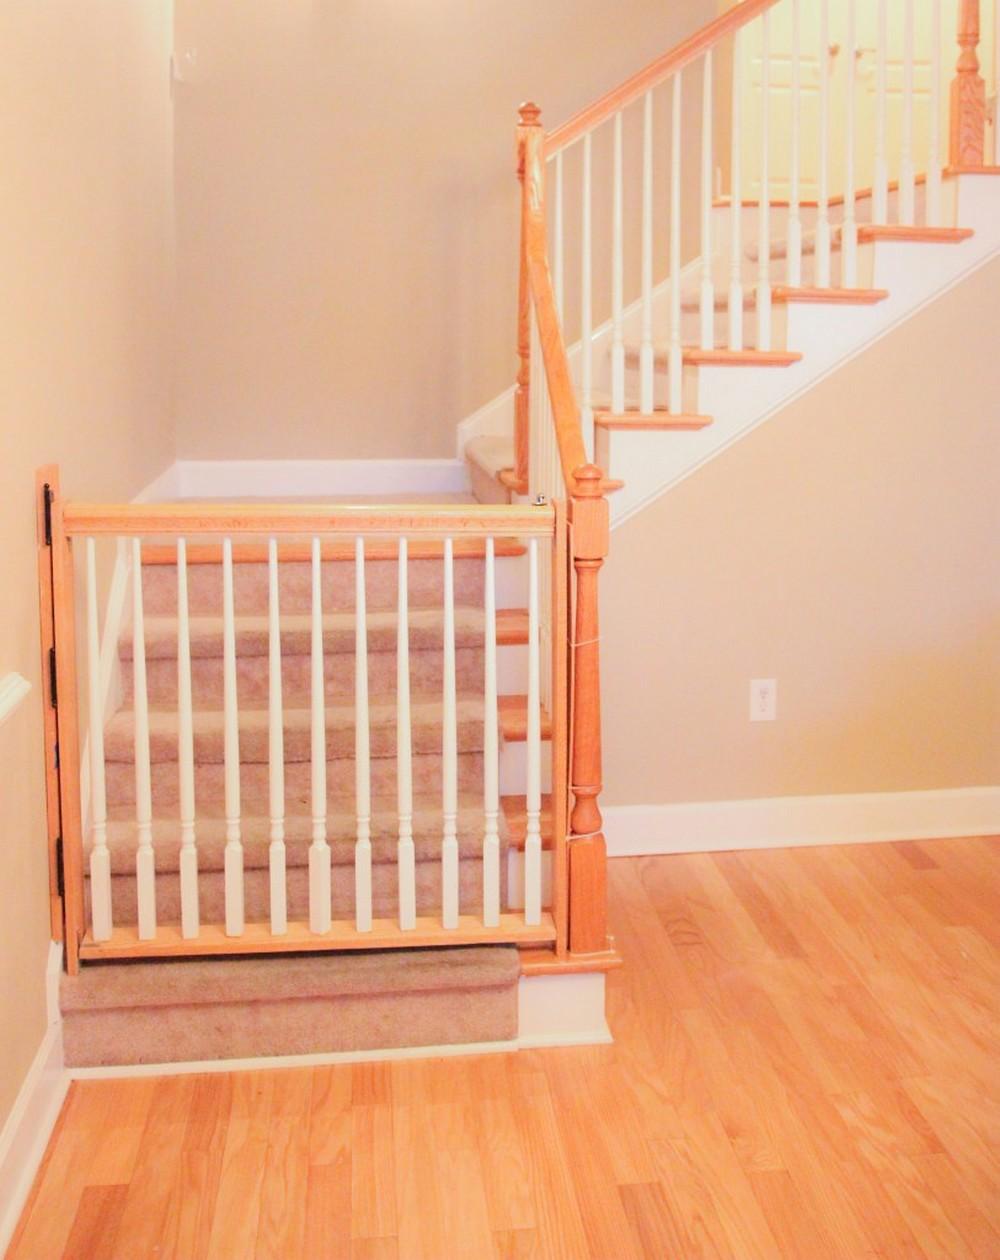 How To Make Stunning Baby Gates